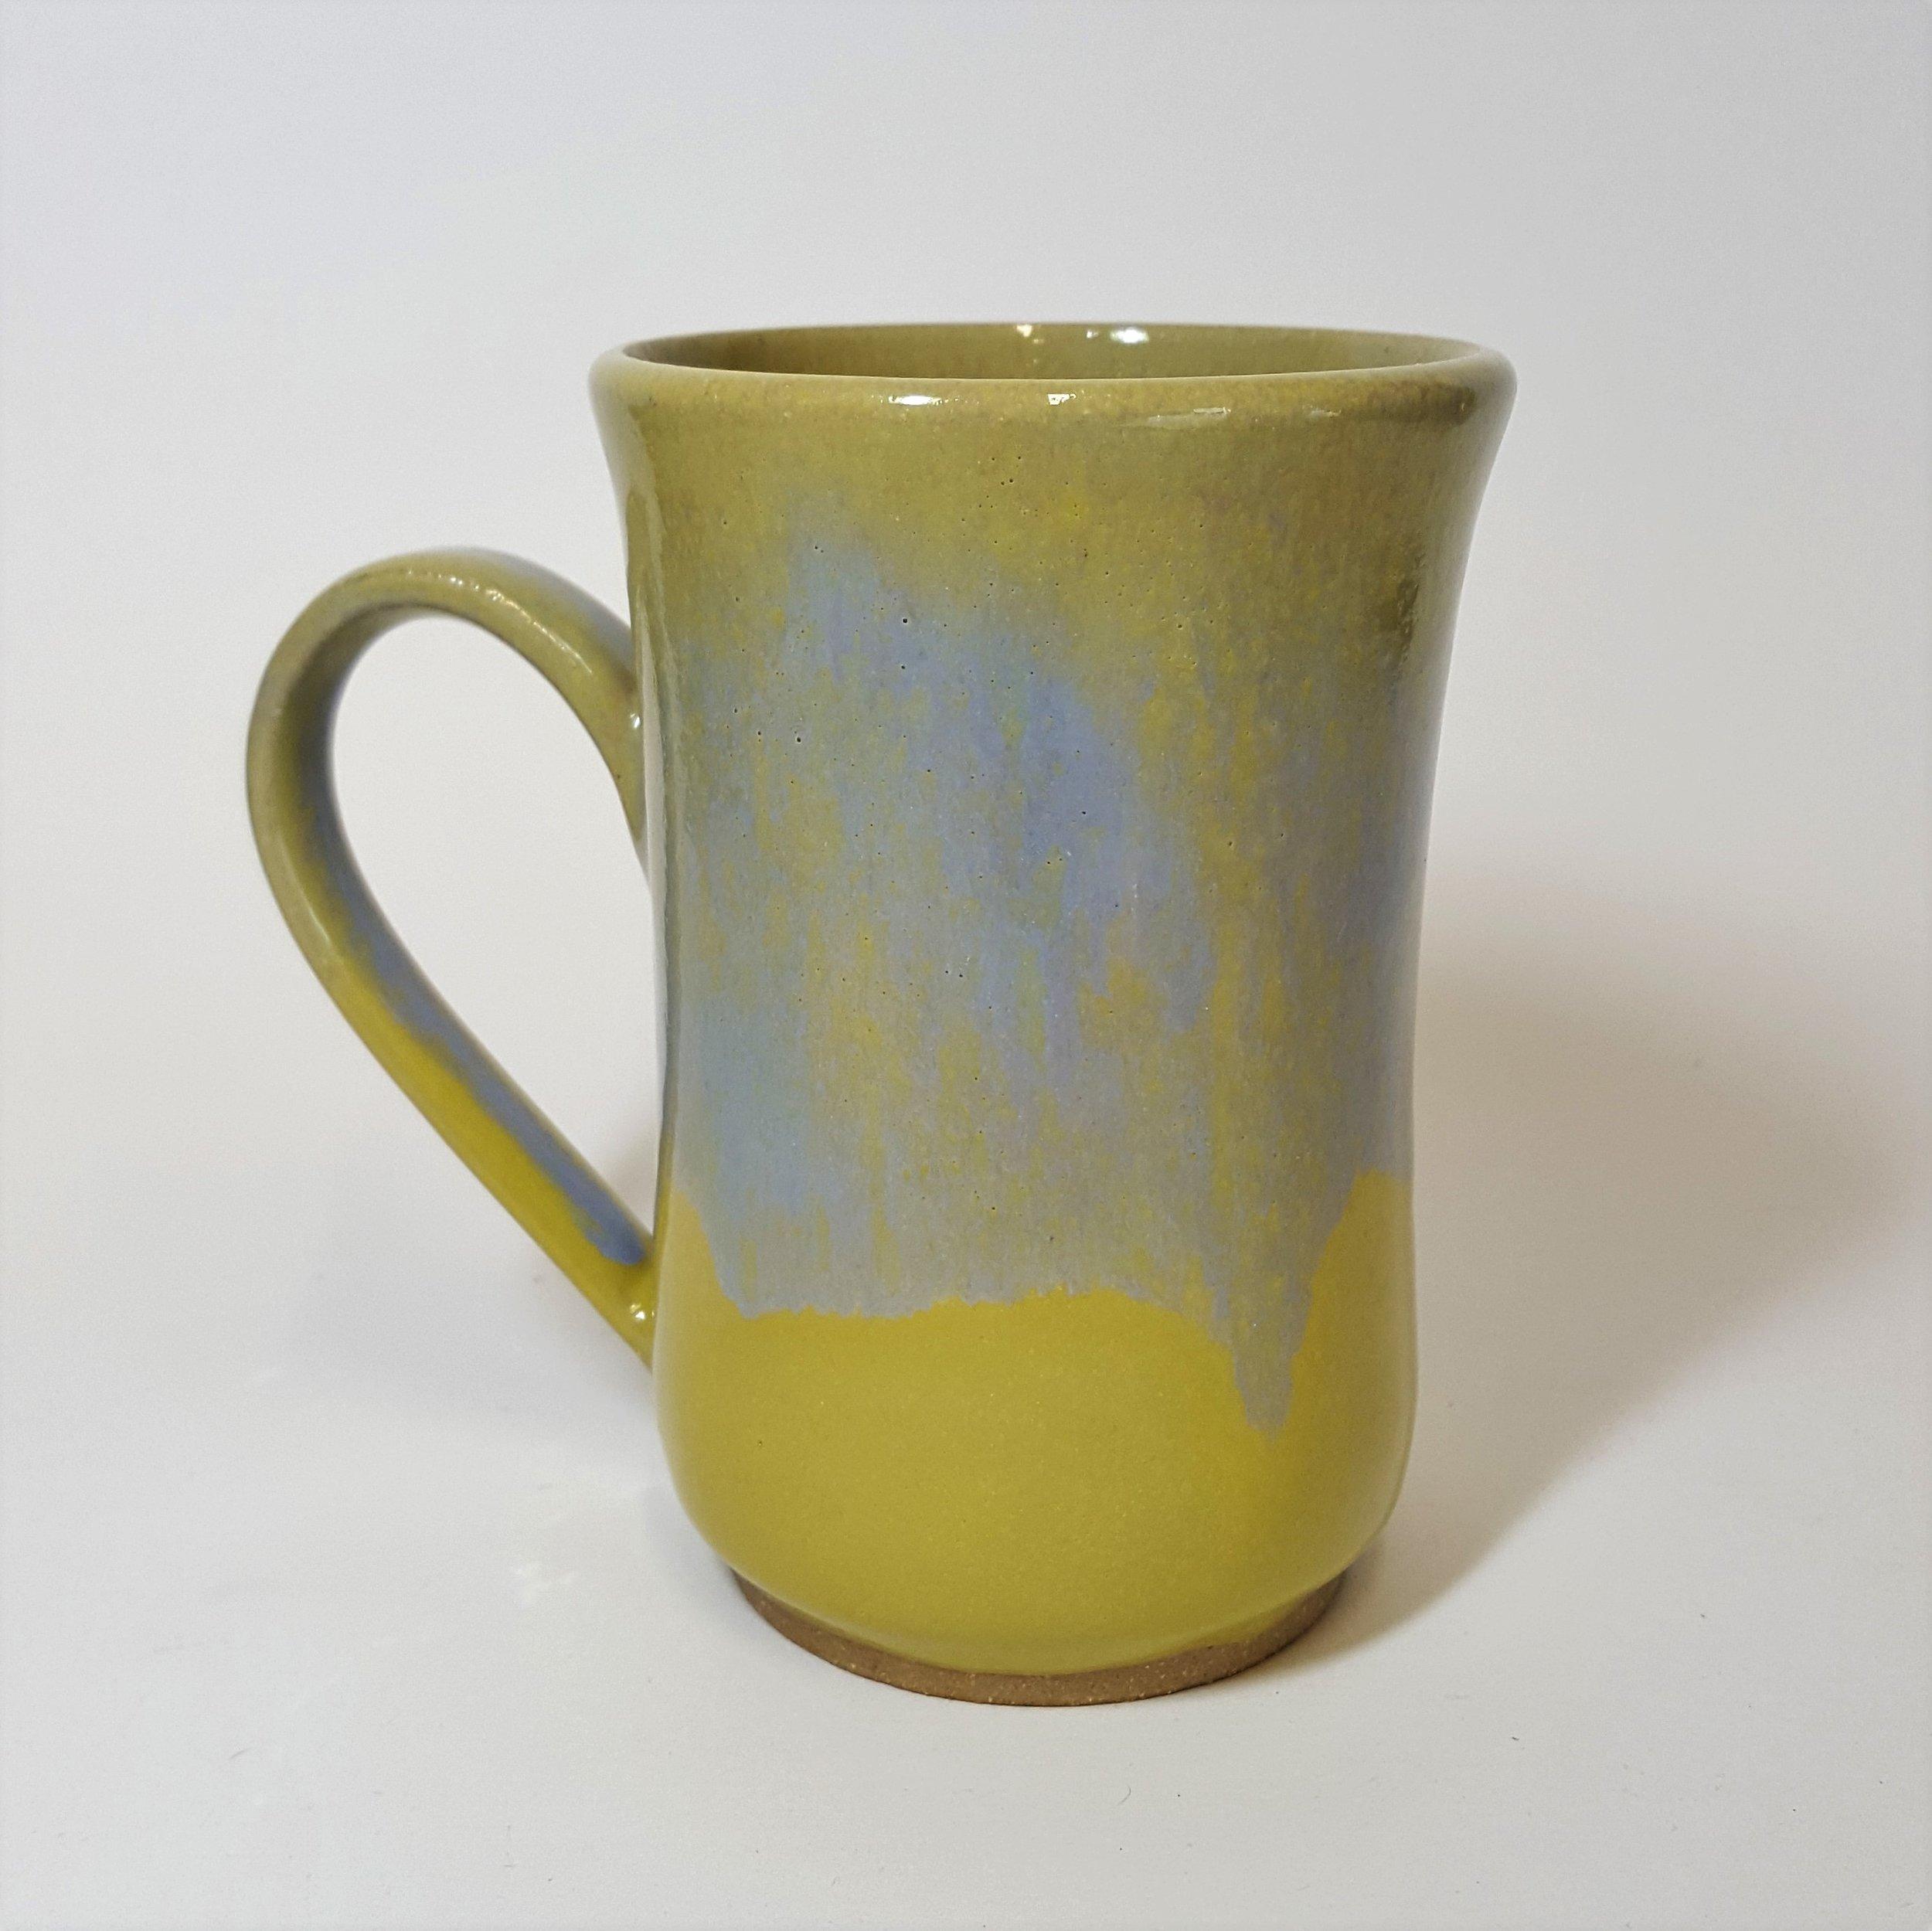 10 oz. Fairy Follies Mug - $28